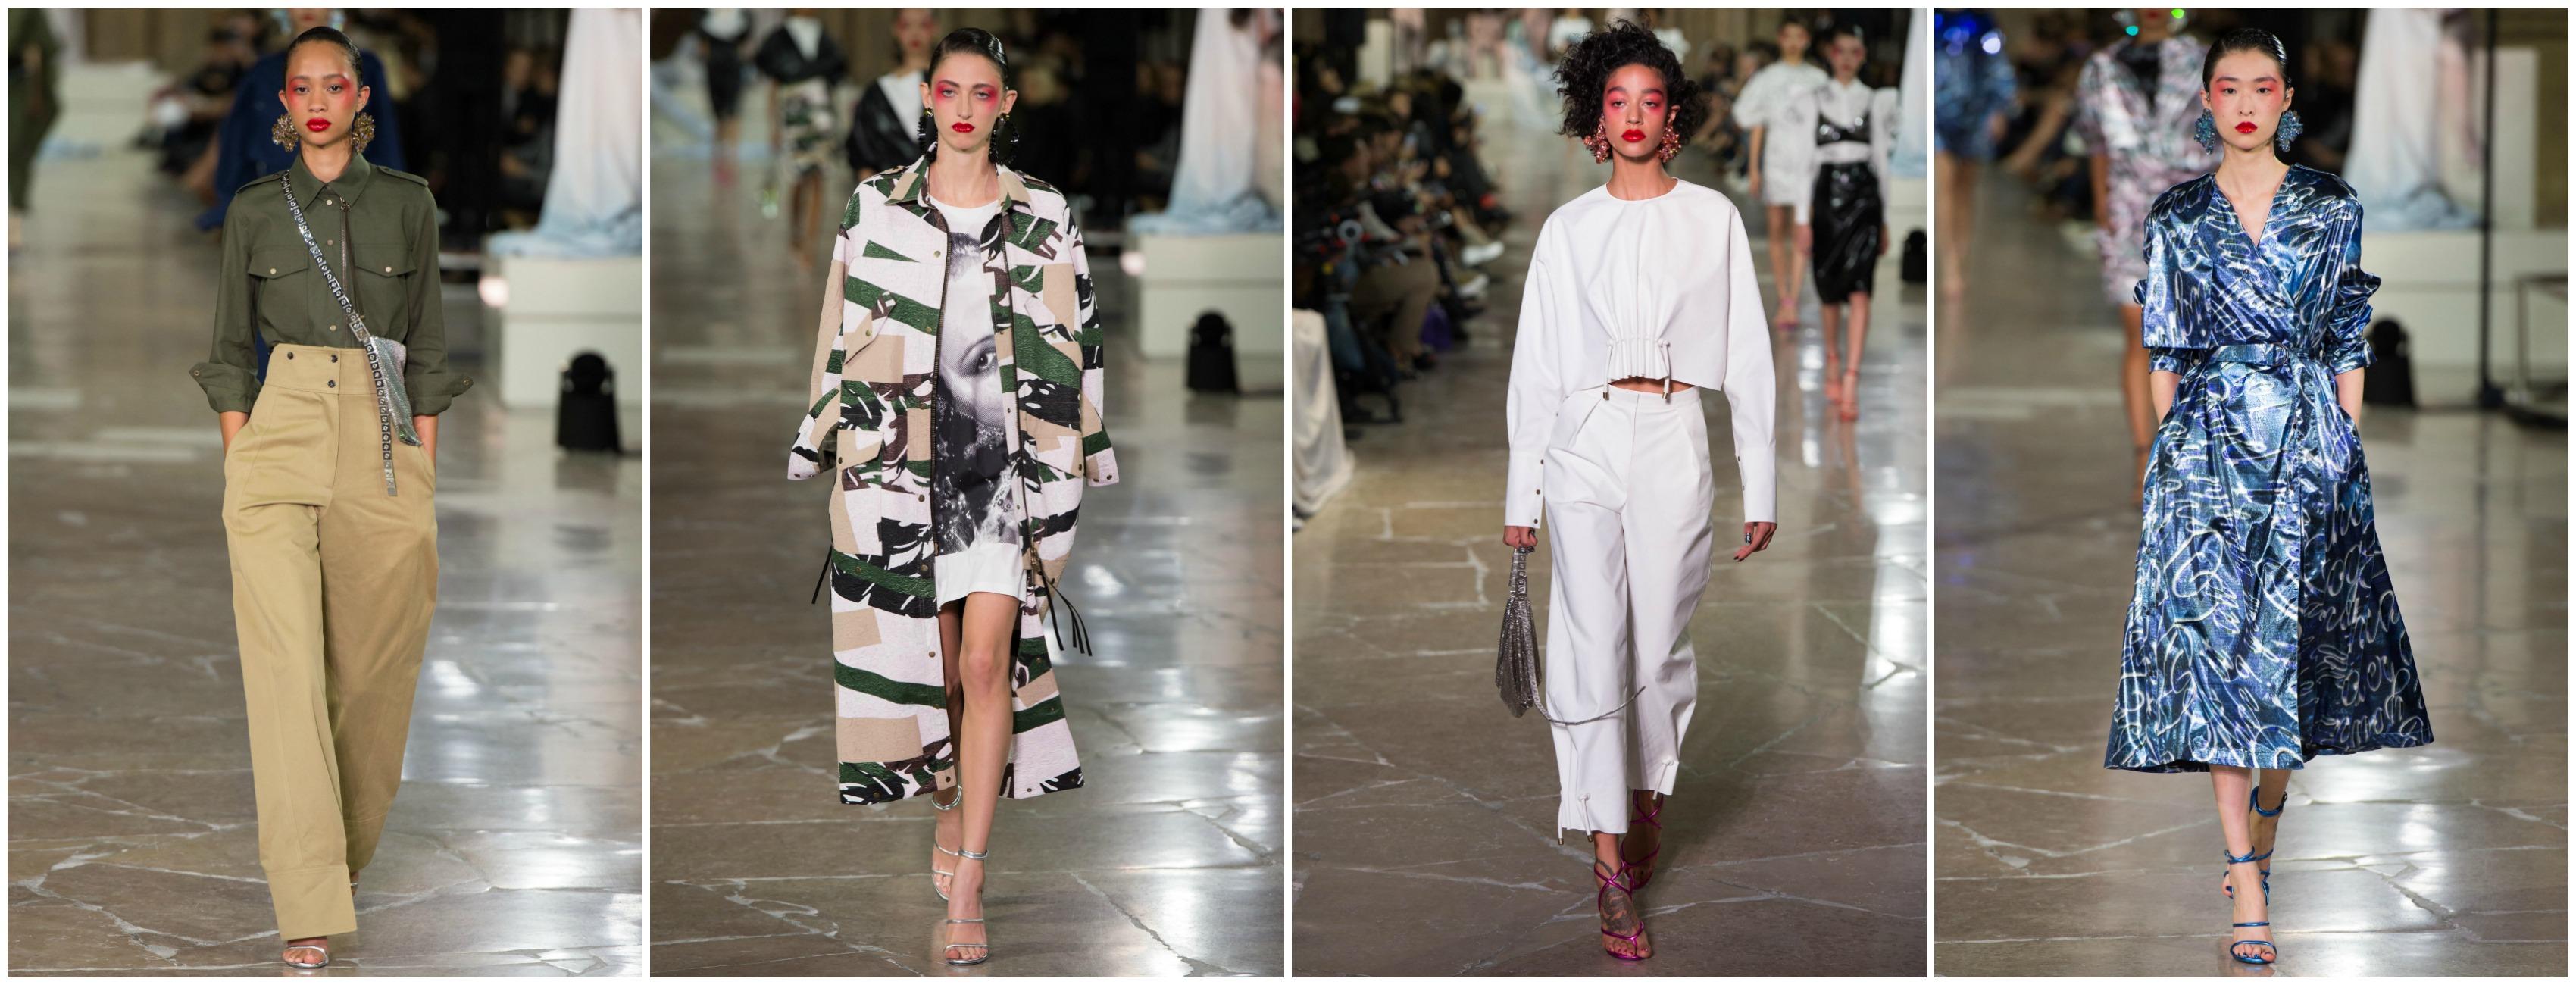 paris fashion week 2016 id couture styling kenzo